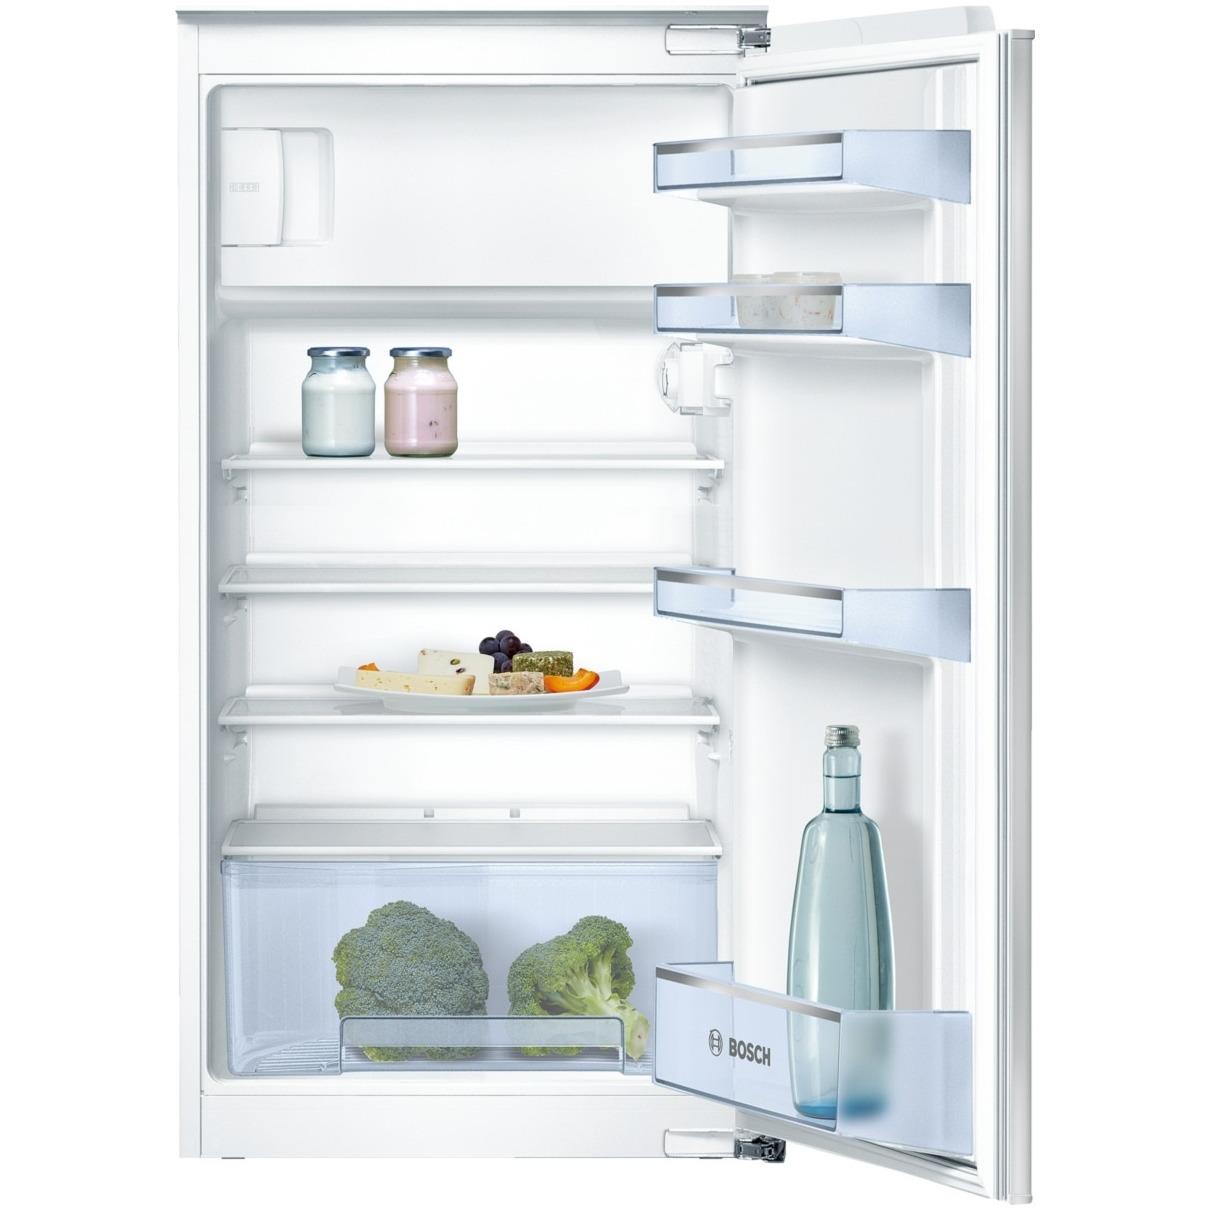 Bosch KIL20V60 combi-koelkast